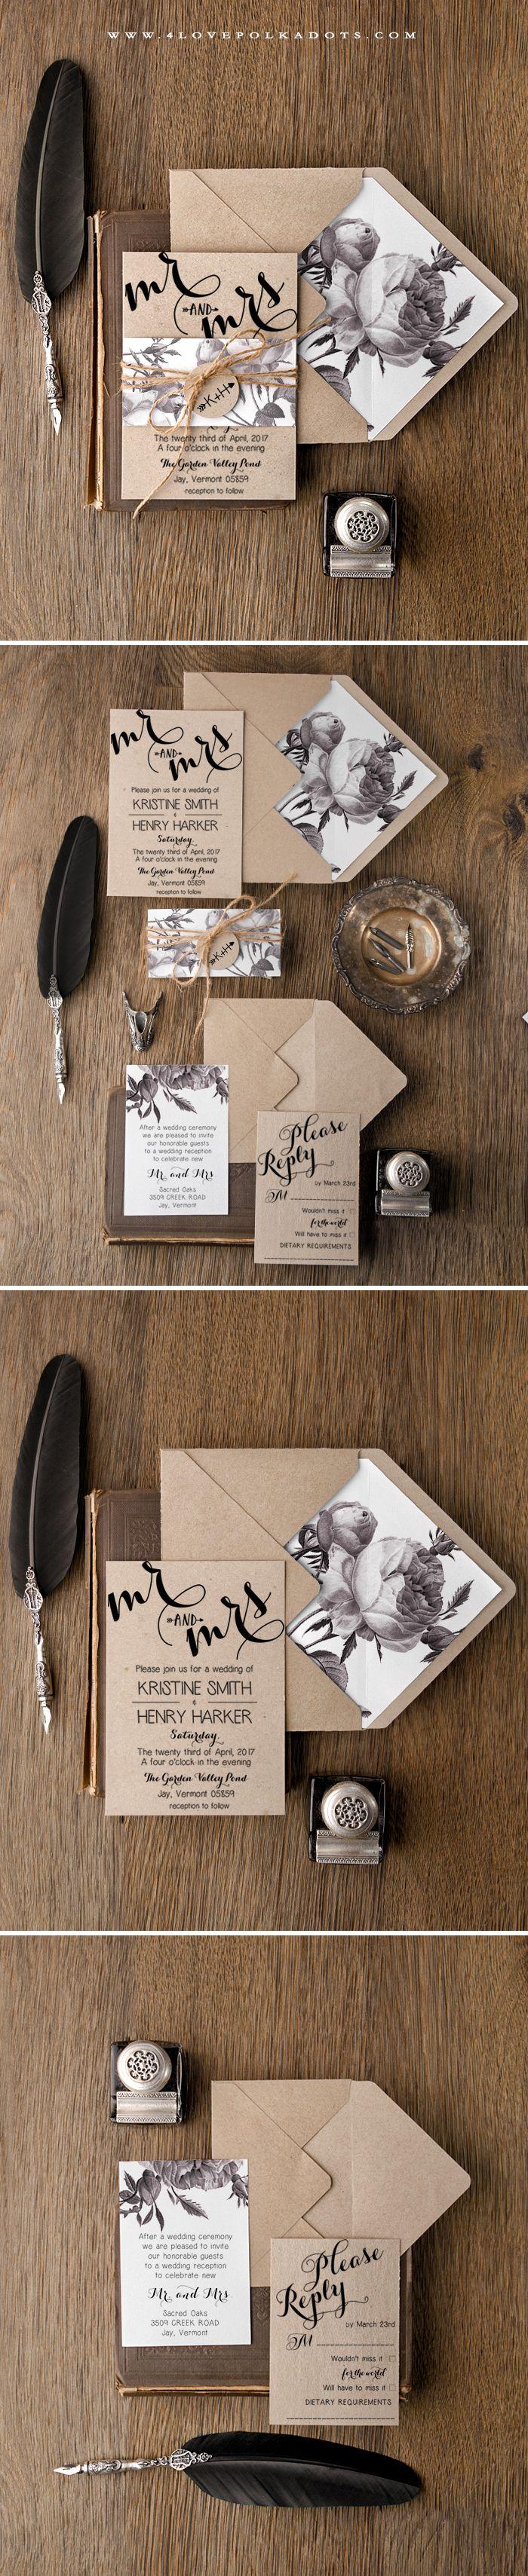 Handmade Rustic Wedding Invitation Ideas: Rustic wedding shower ...